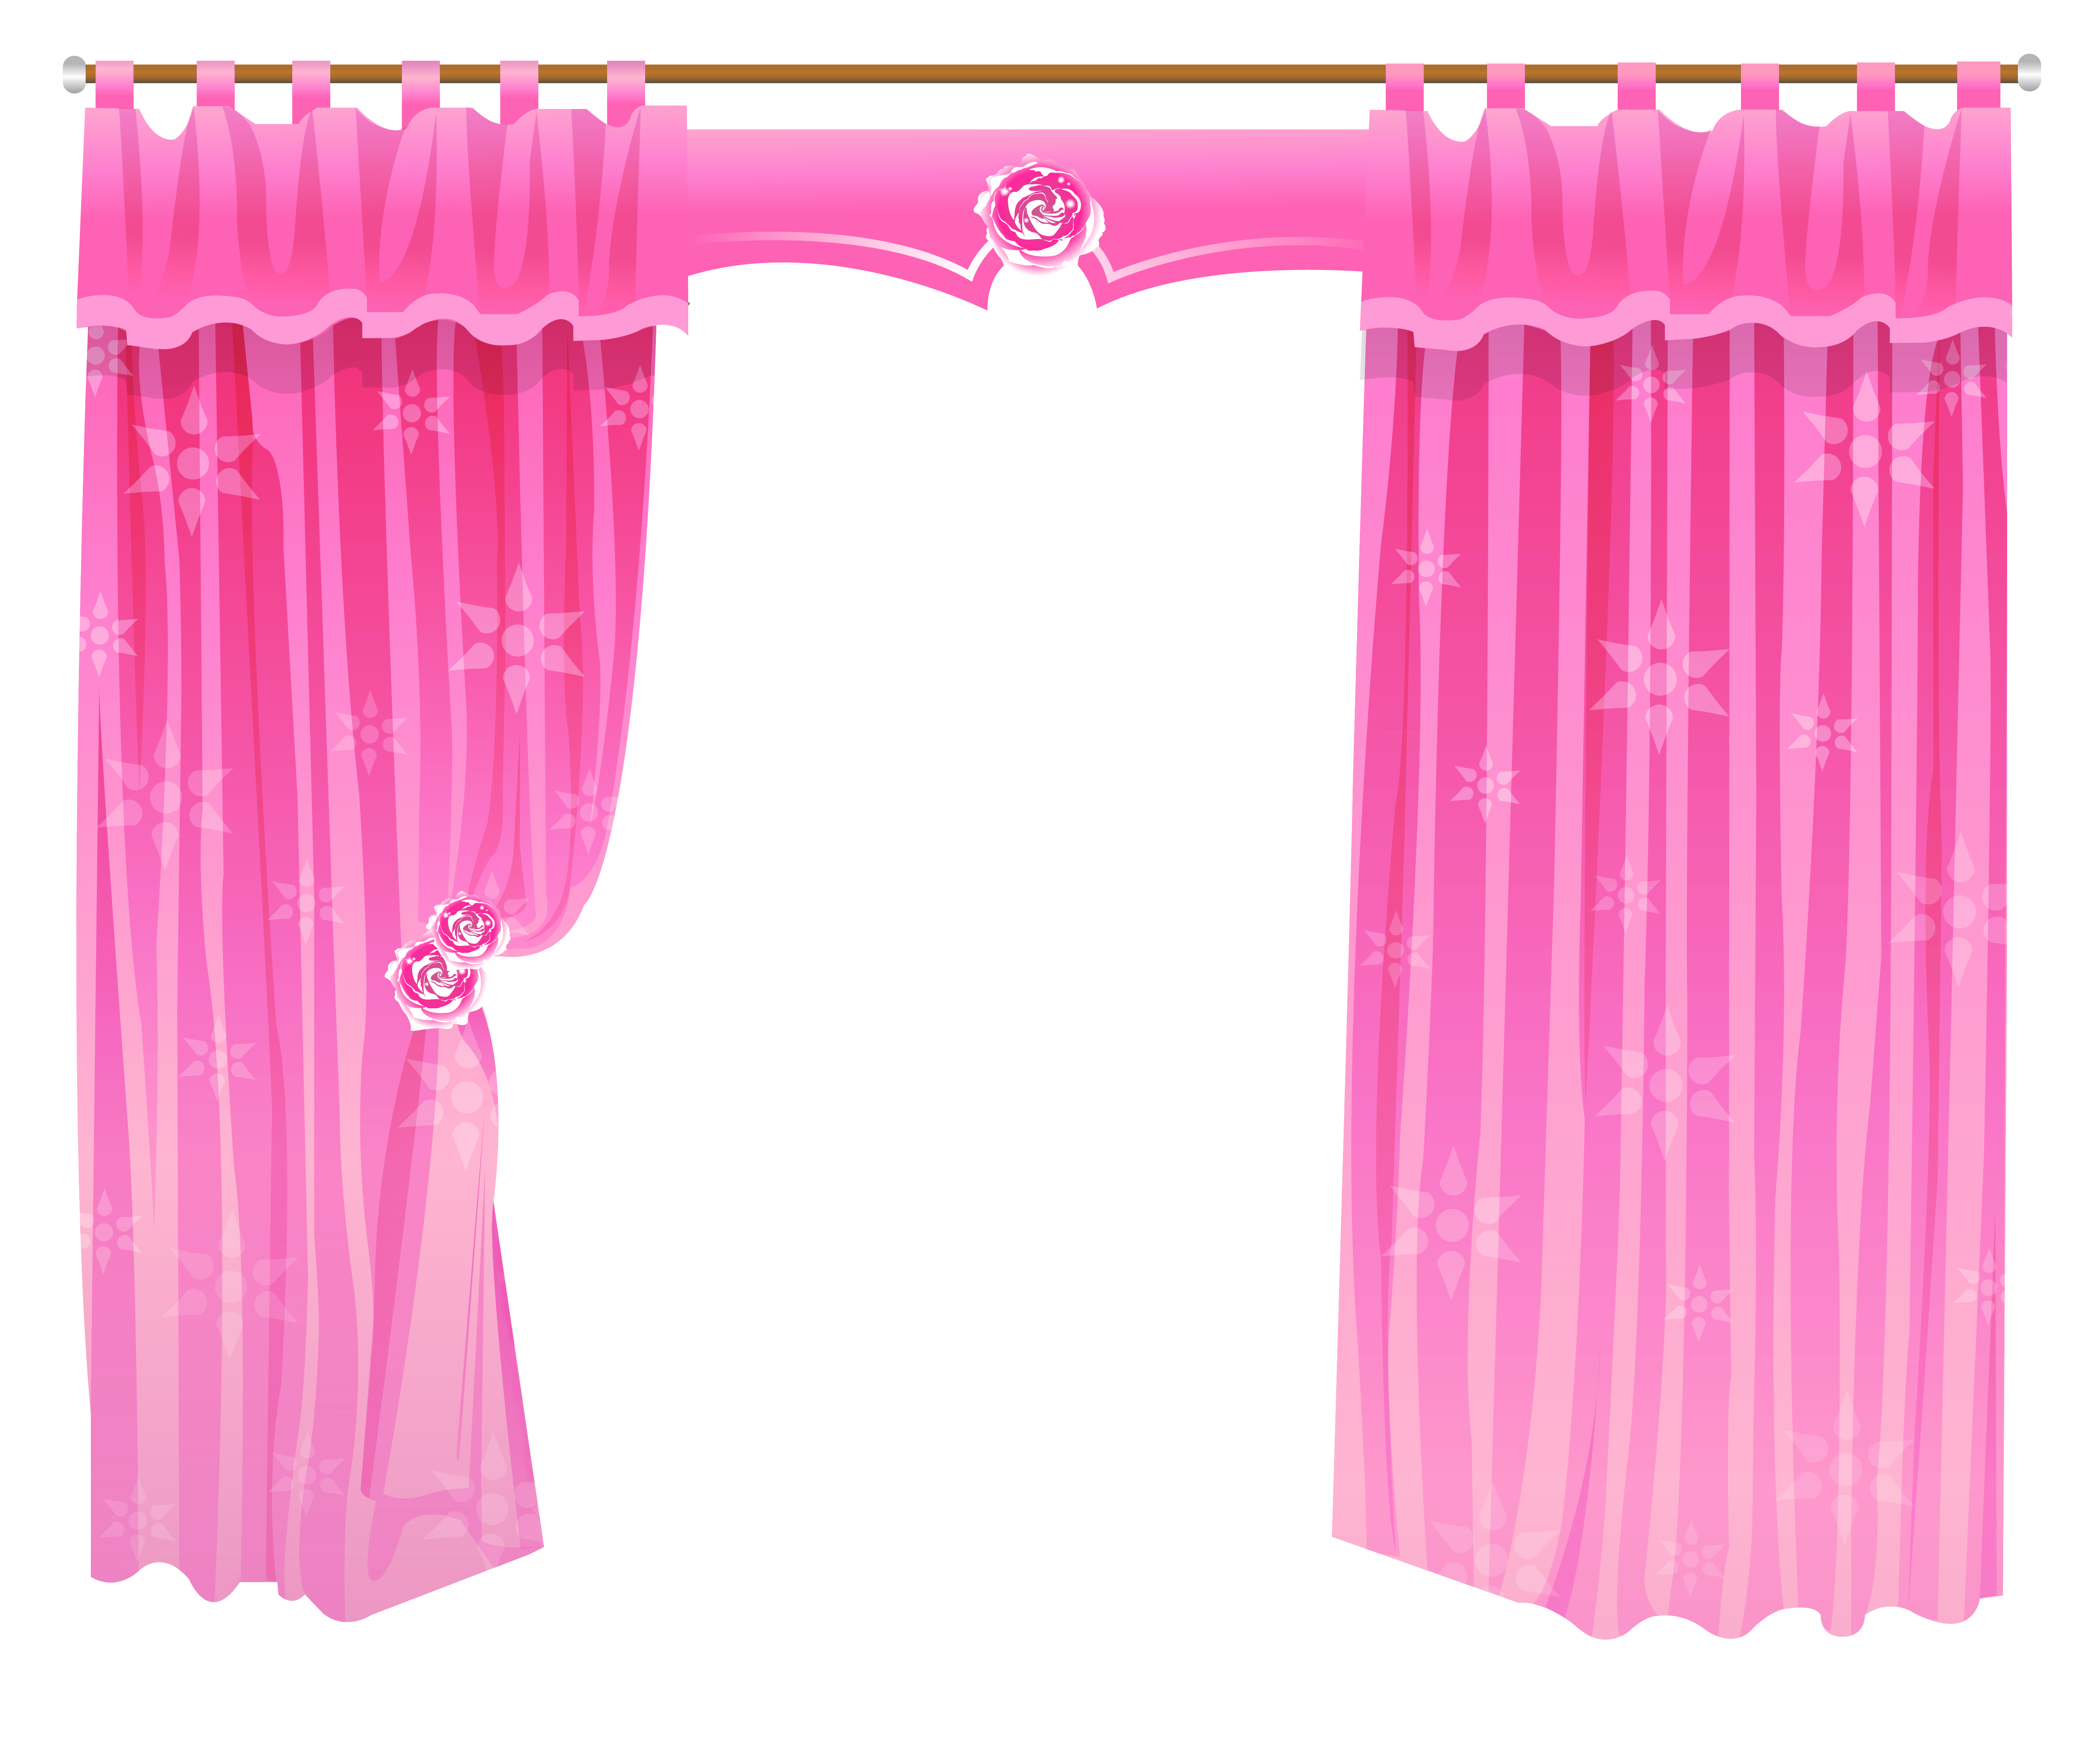 Clipart drapes vector stock Free Curtain Cliparts, Download Free Clip Art, Free Clip Art on ... vector stock